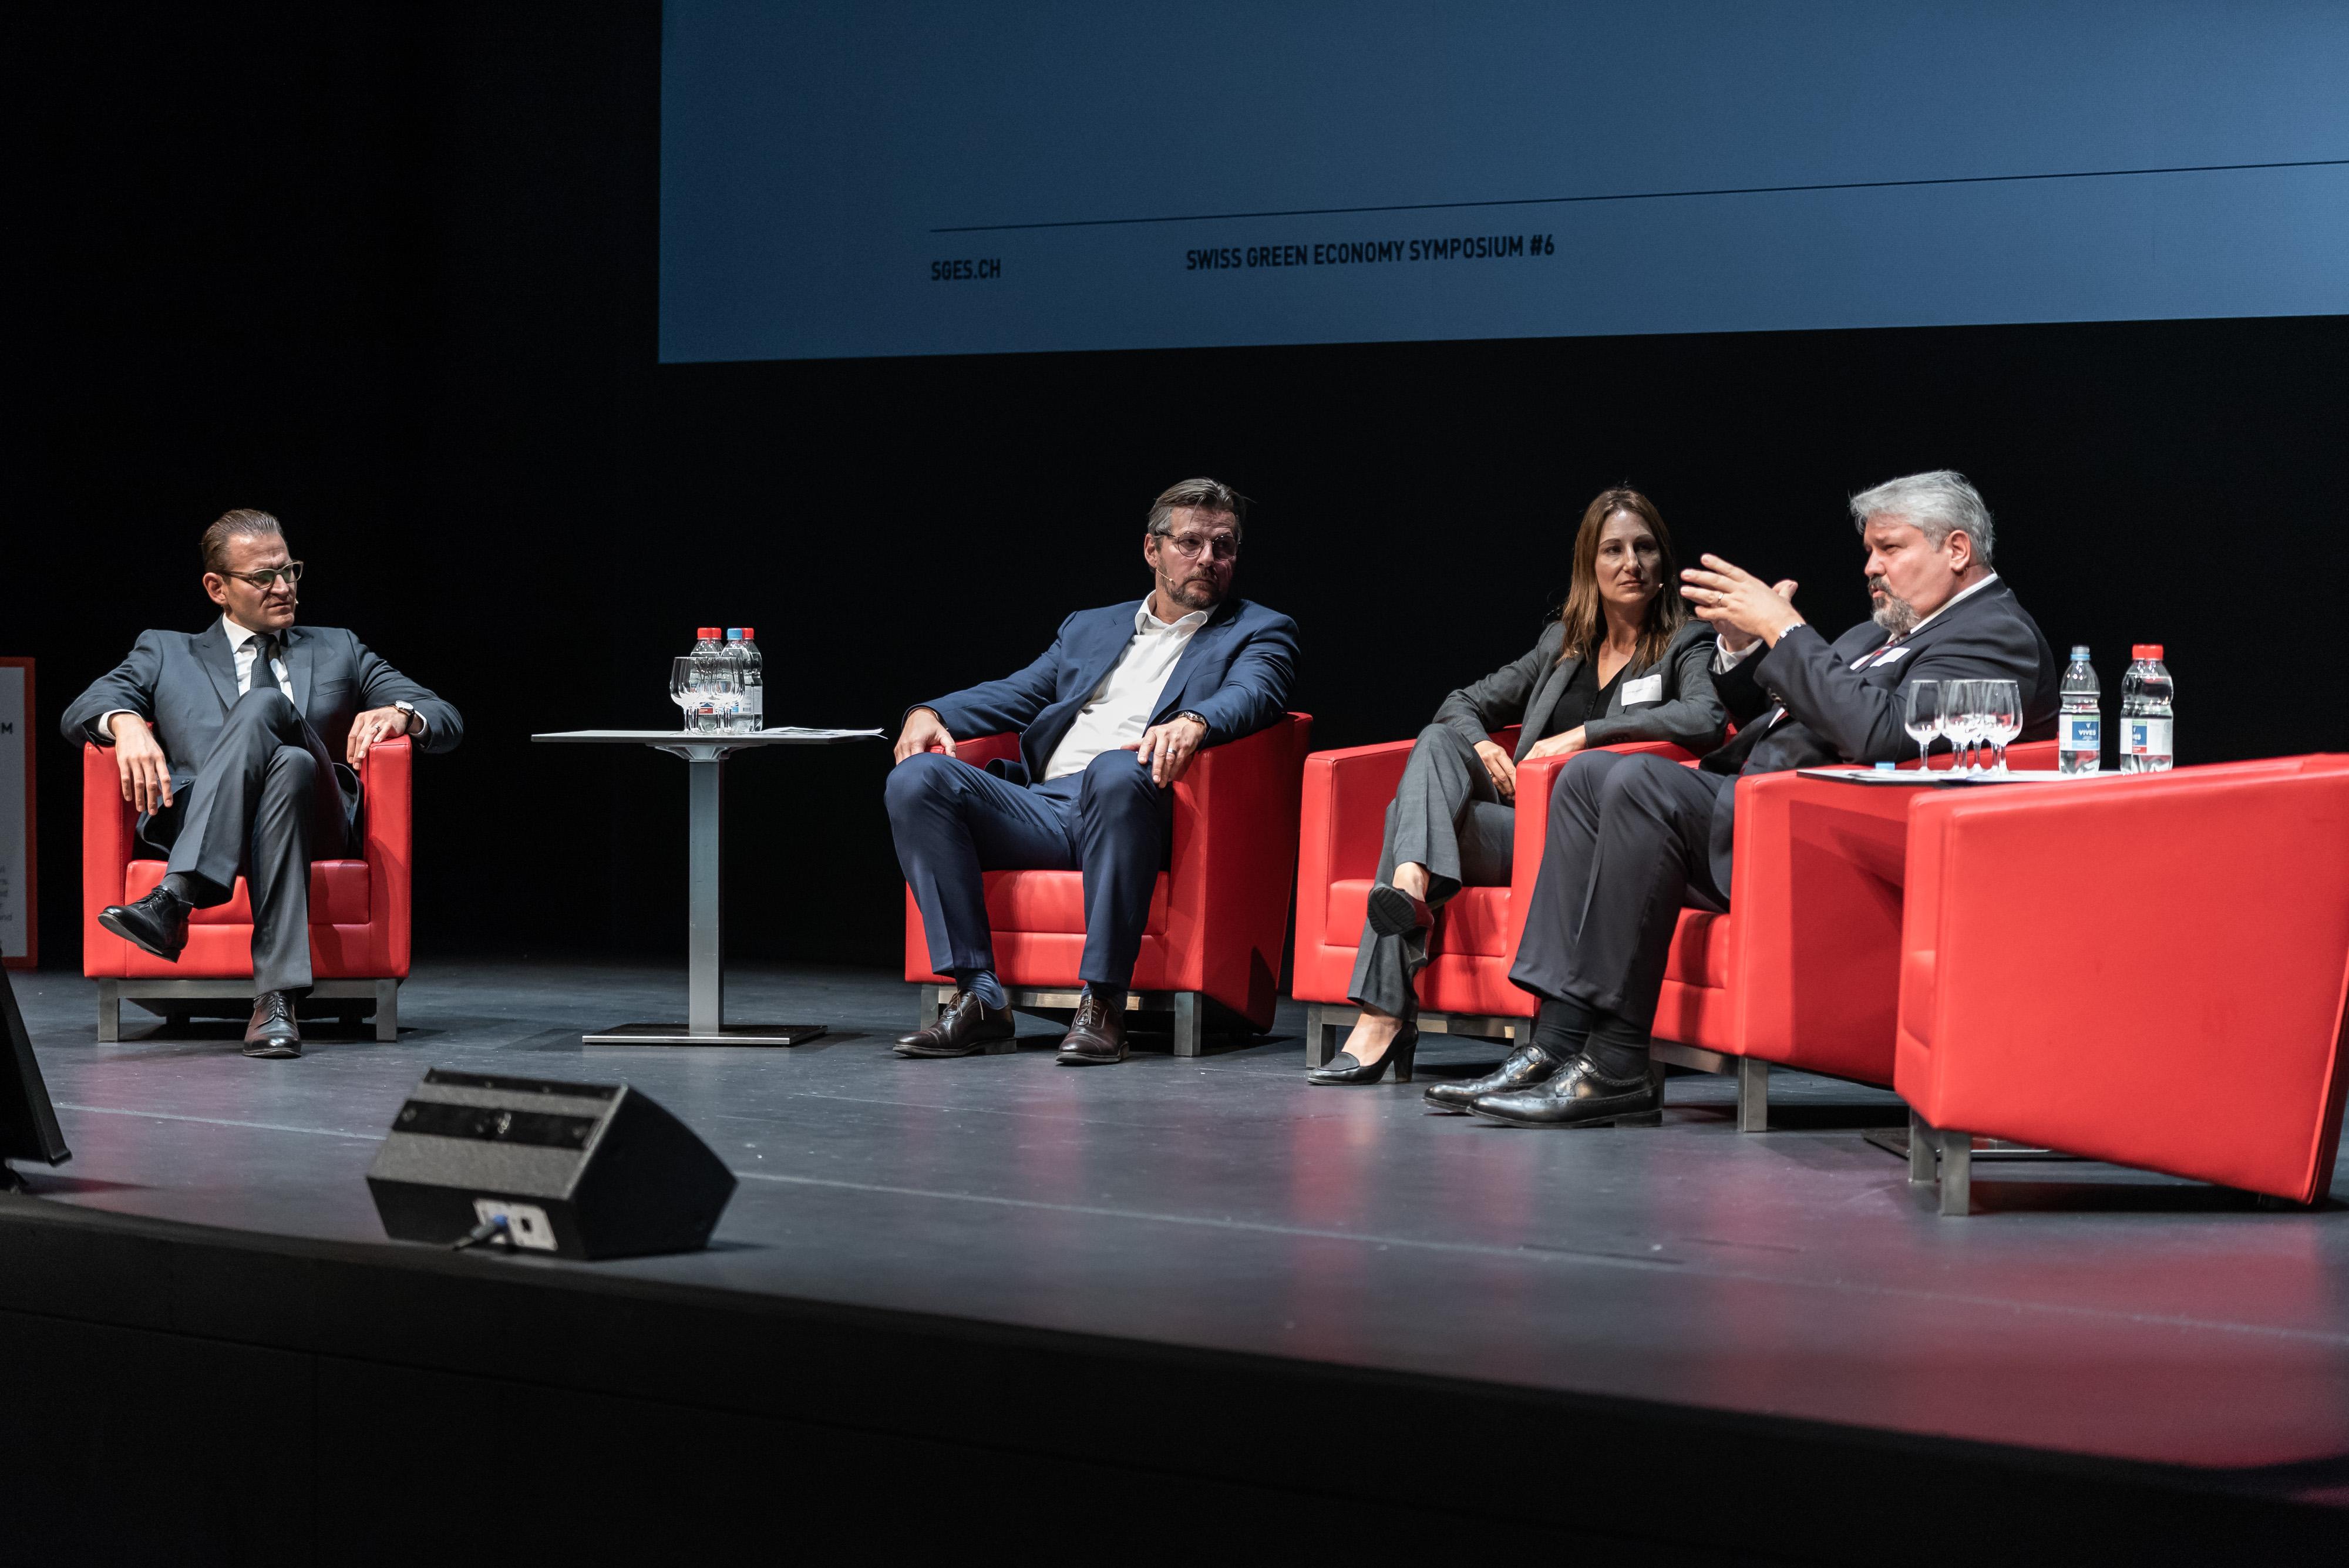 SGES 2018 Power Panel Michael Wider, Präsident VSE/AES Verband Schweizerischer Elektriziätsunternehmen; Adèle Thorens Goumaz, Nationalrätin; Michael Künzle, Stadtpräsident Winterthur.